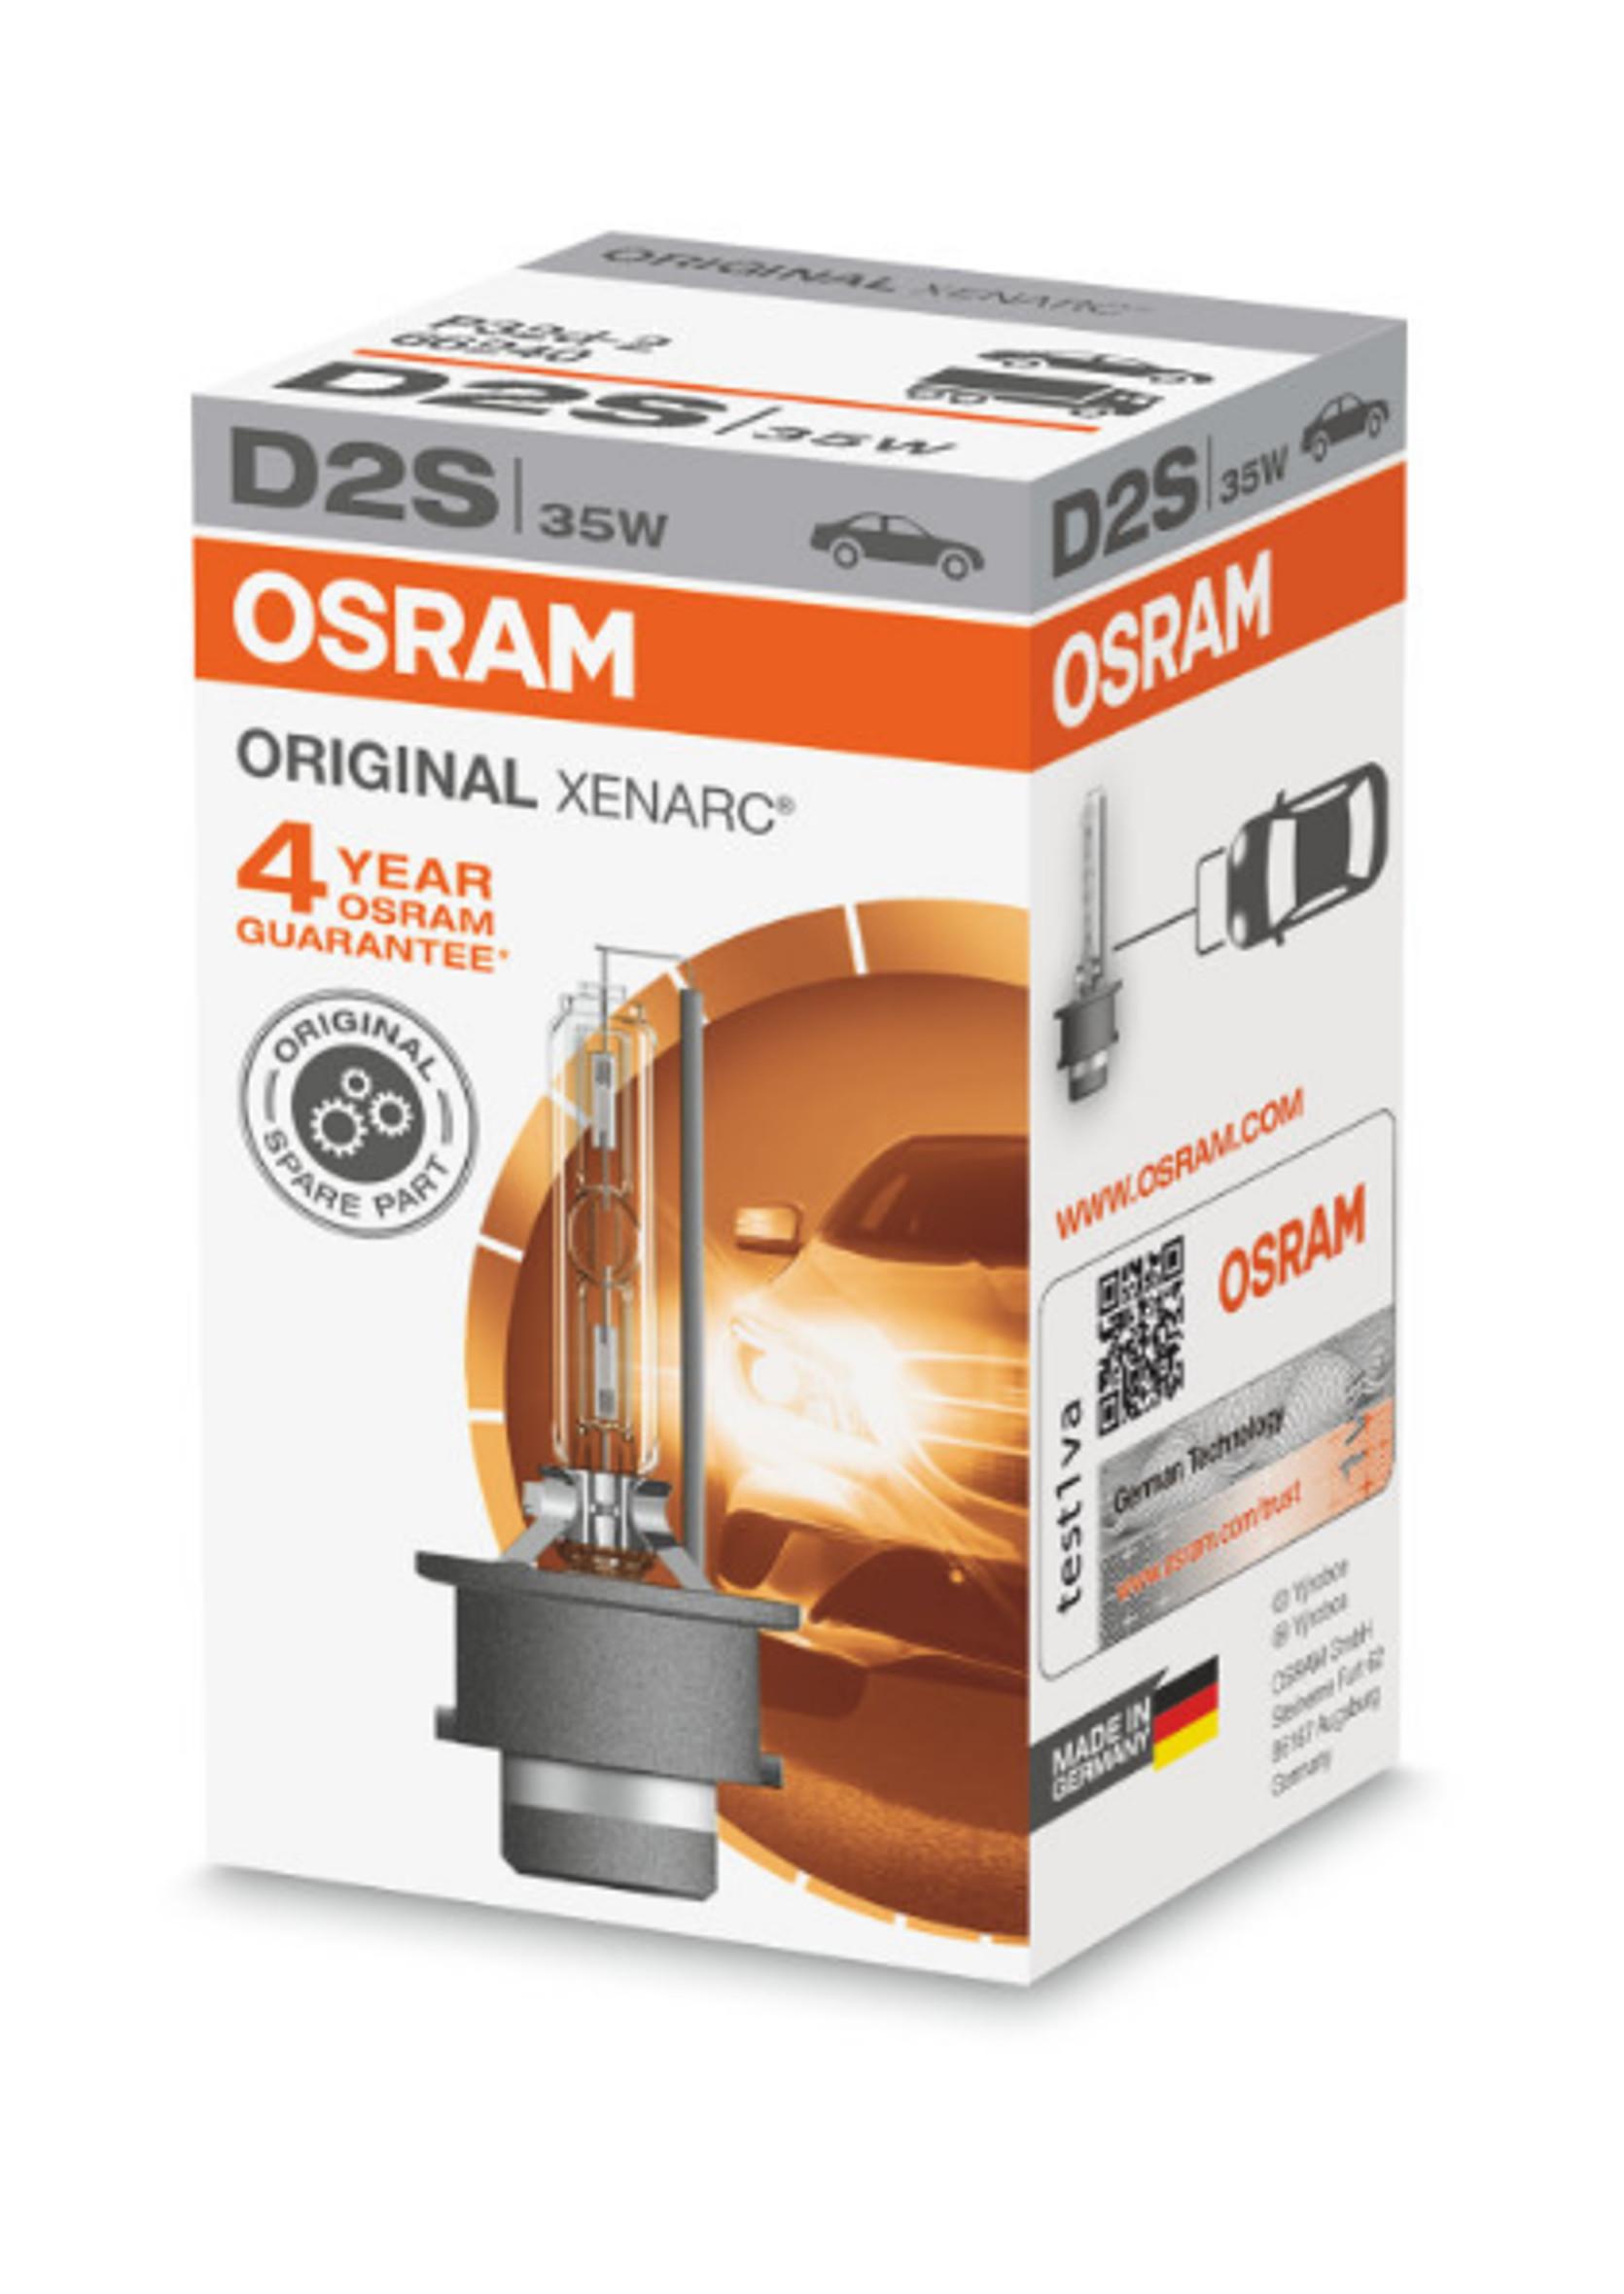 Osram Xenarc Original D2S 85V 35W 1szt Żarnik Ksenonowy